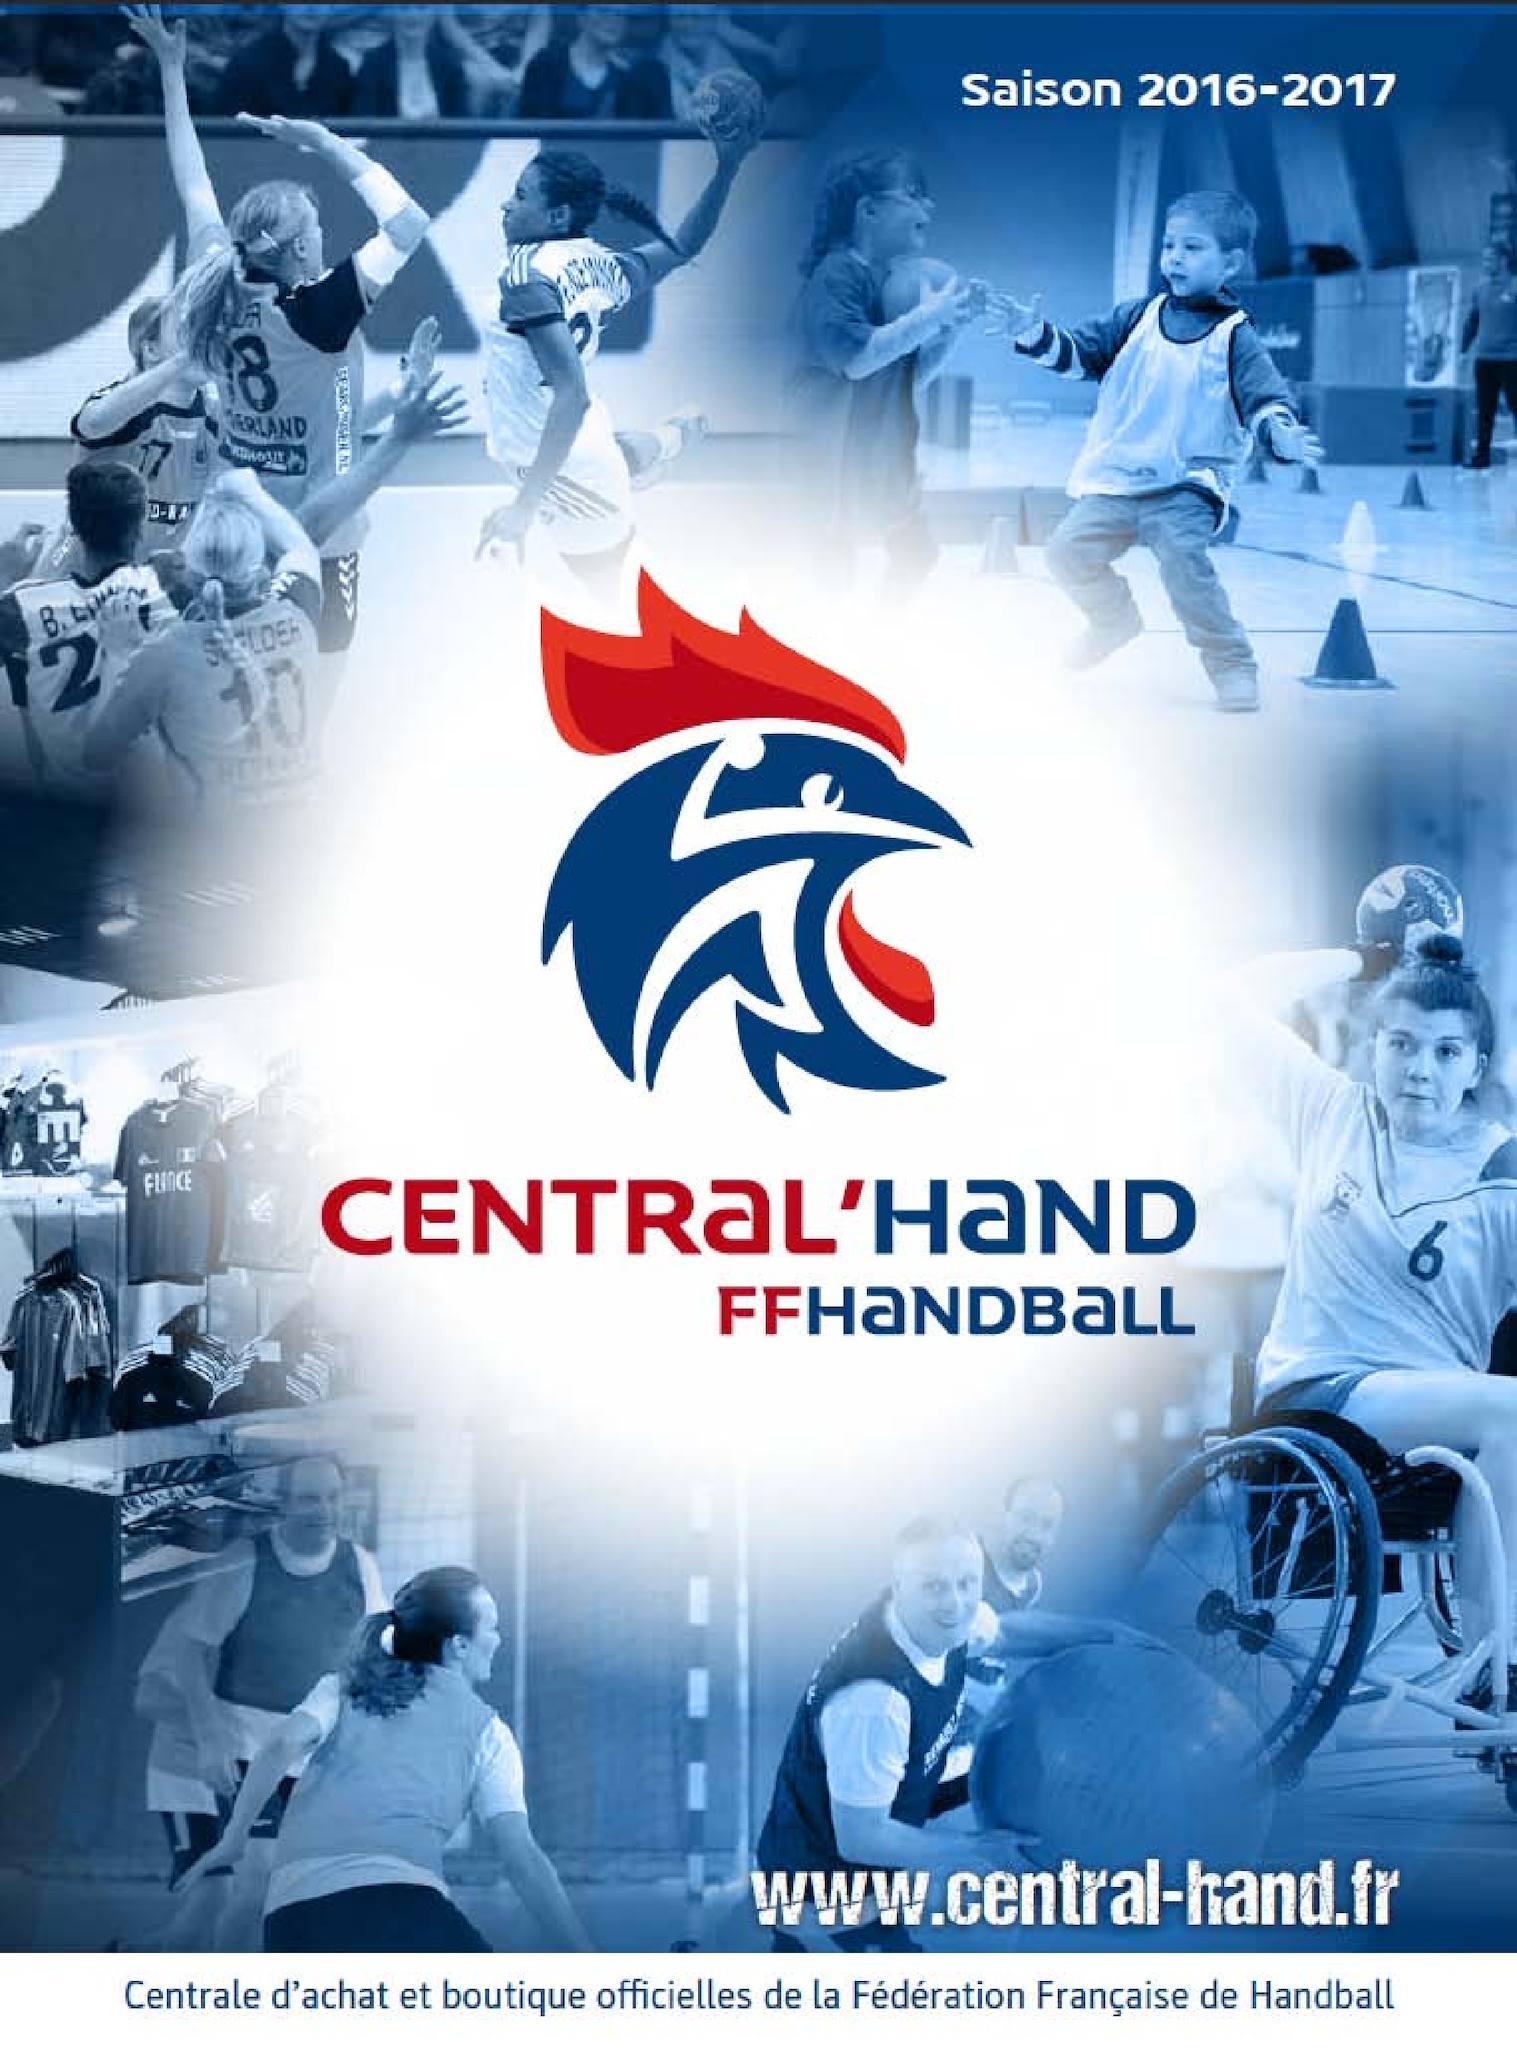 hot sale online 8427f 841f9 Calaméo - Central Hand Catalogue 2016-2017